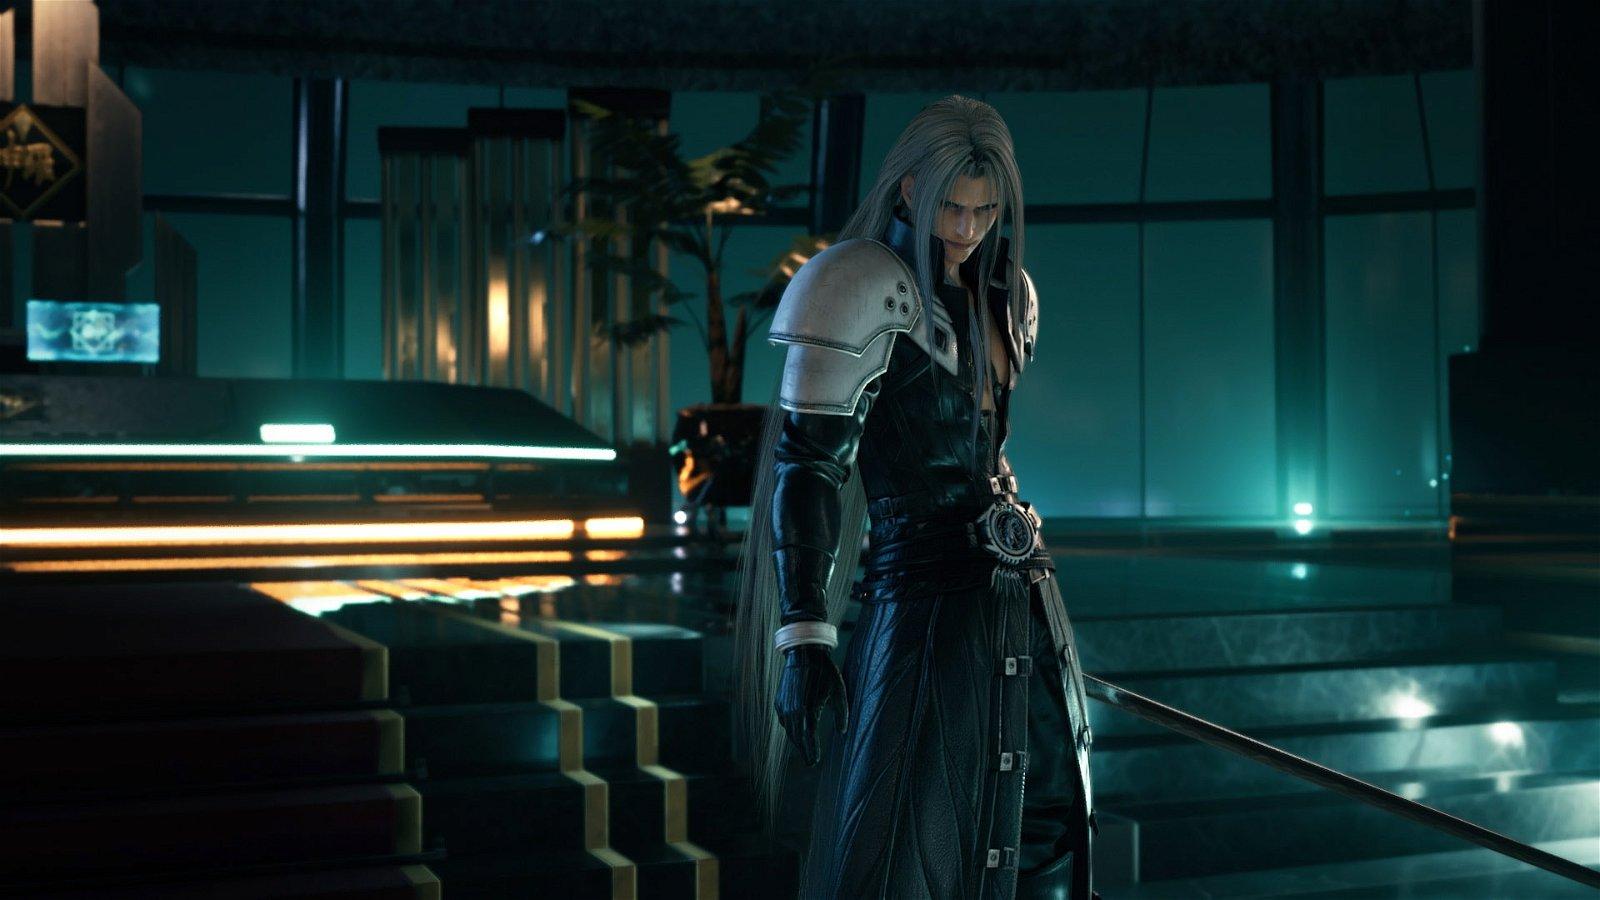 Square Enix Delays Final Fantasy VII Remake to April 2020